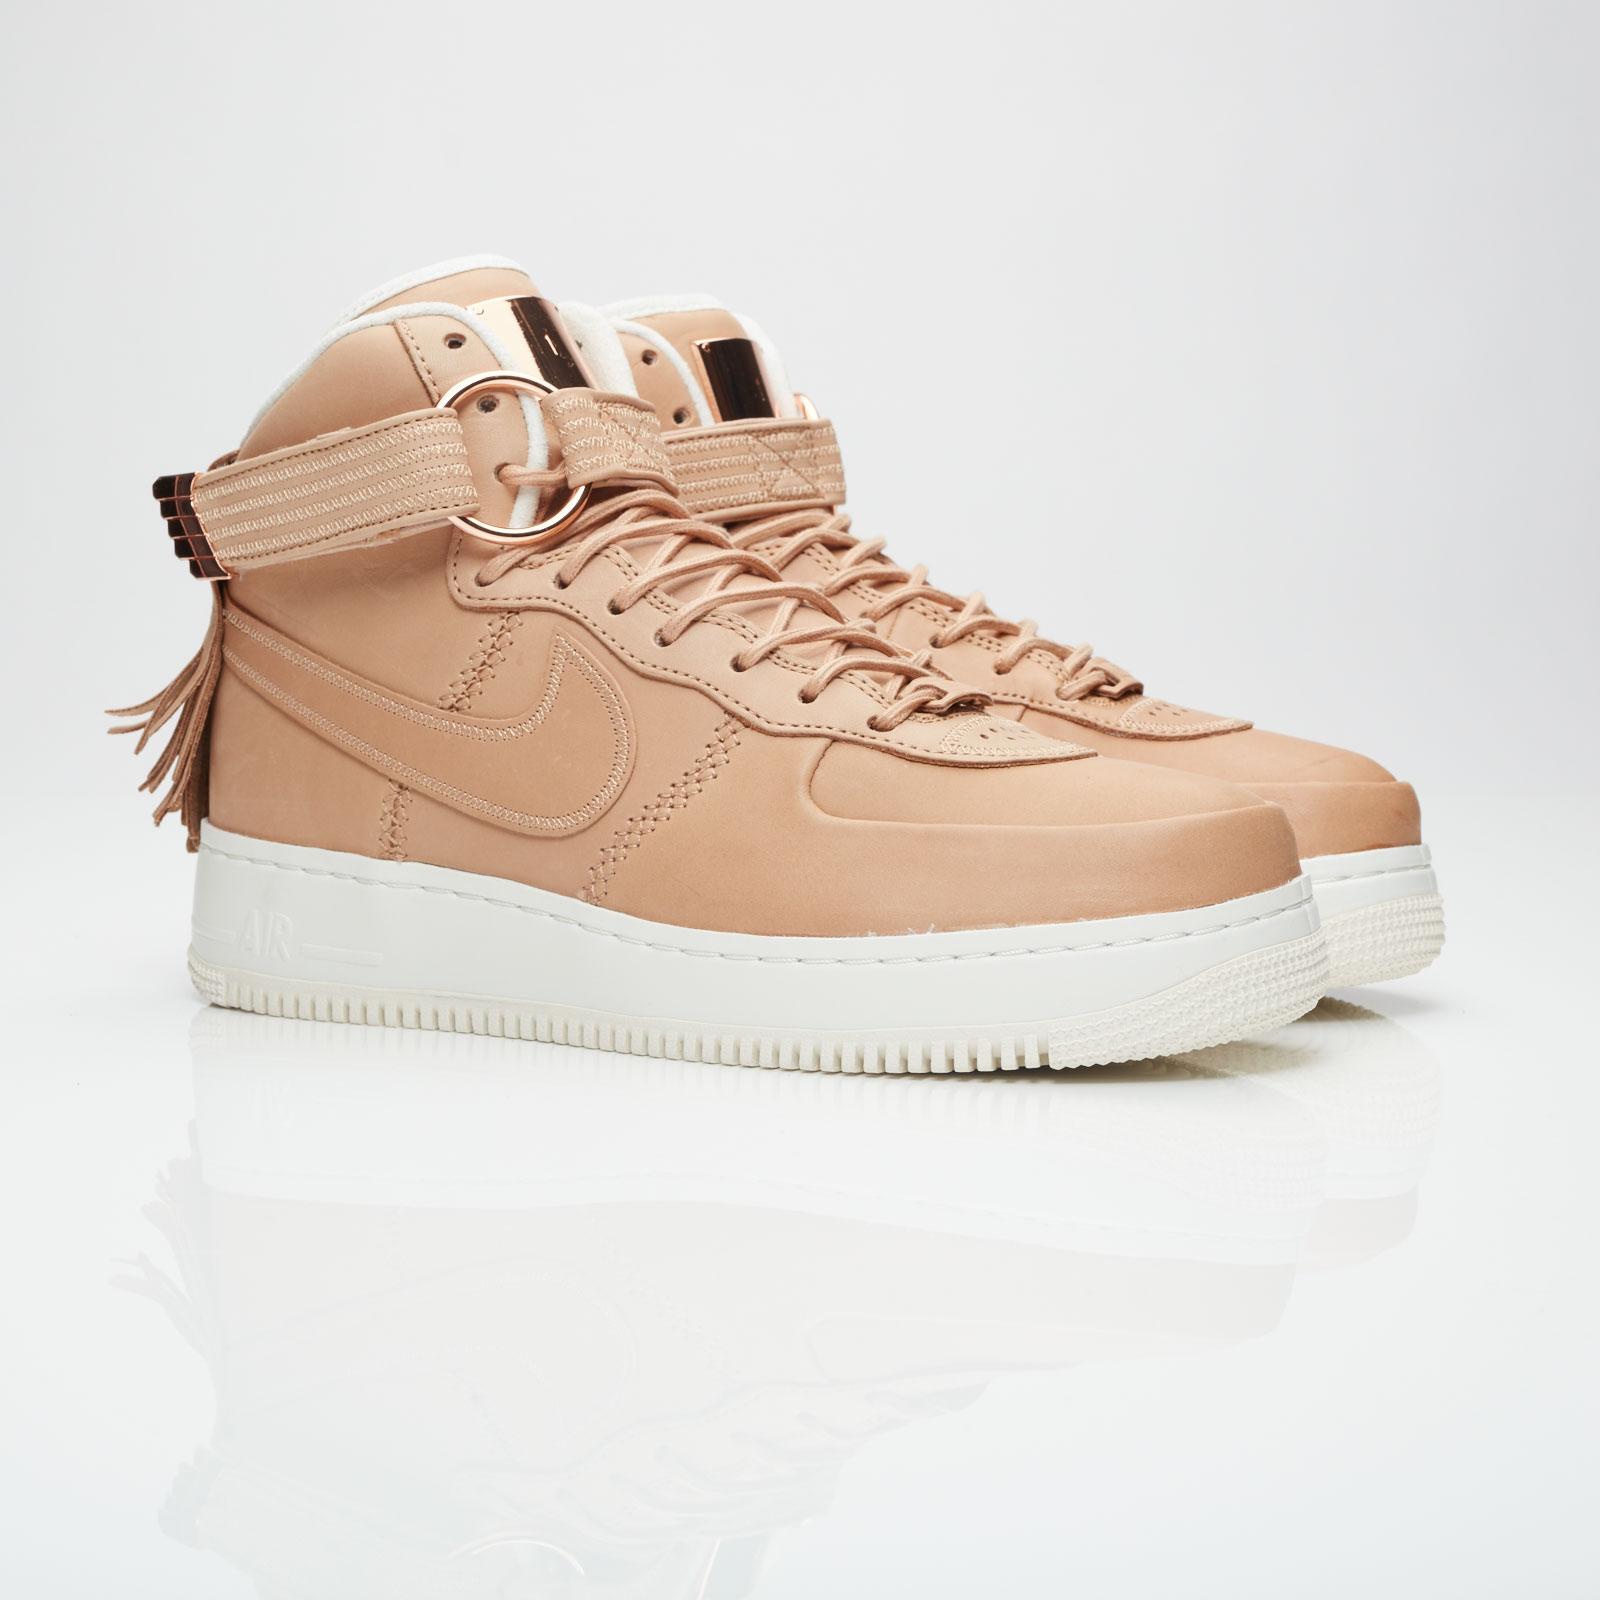 Nike AIR FORCE 1 HI PREMIUM W Beige ExskCLKz